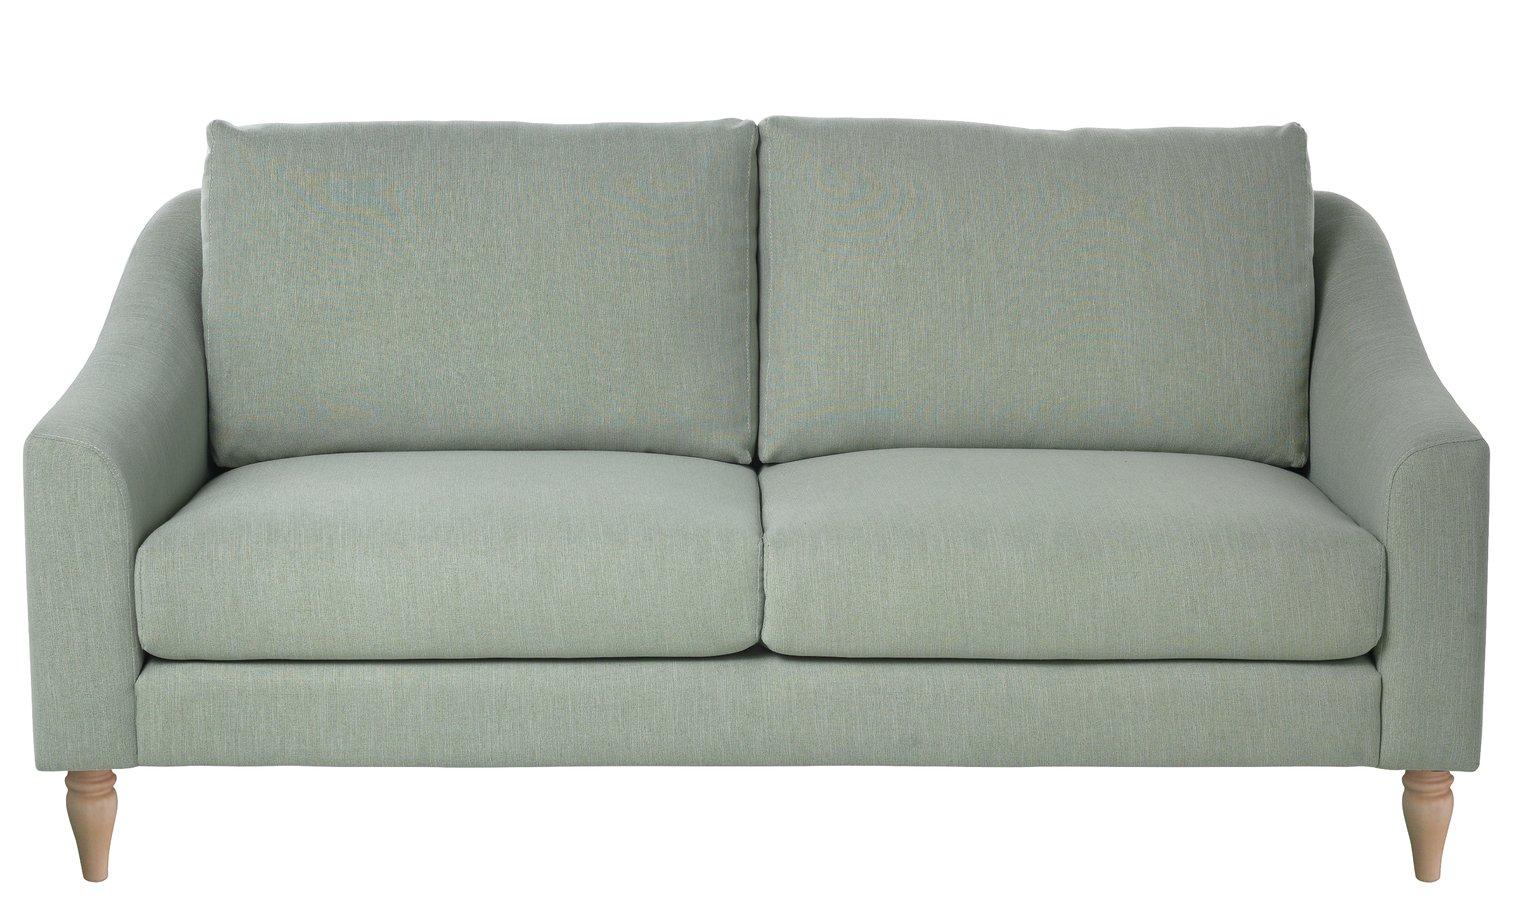 Argos Home Cameron 3 Seater Fabric Sofa - Sage